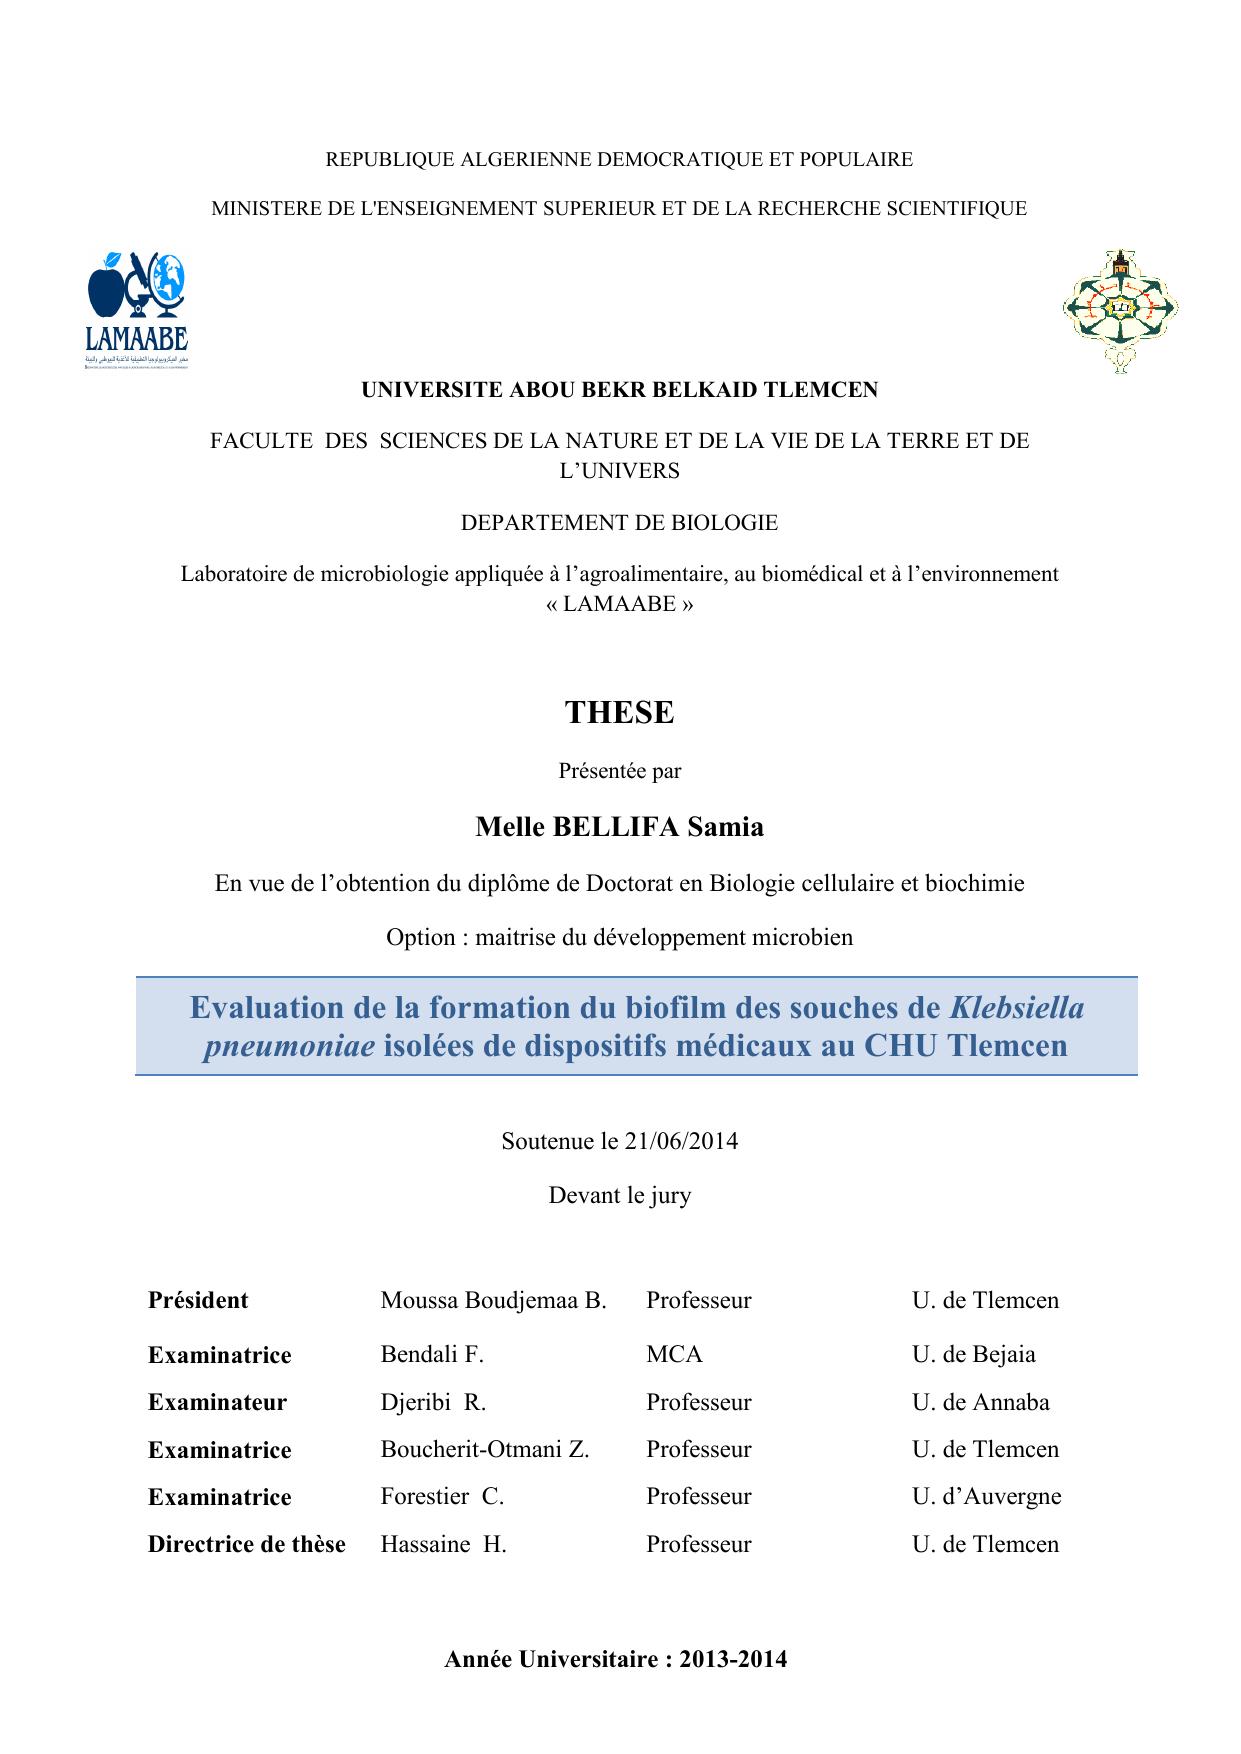 bellifa Samia.pdf